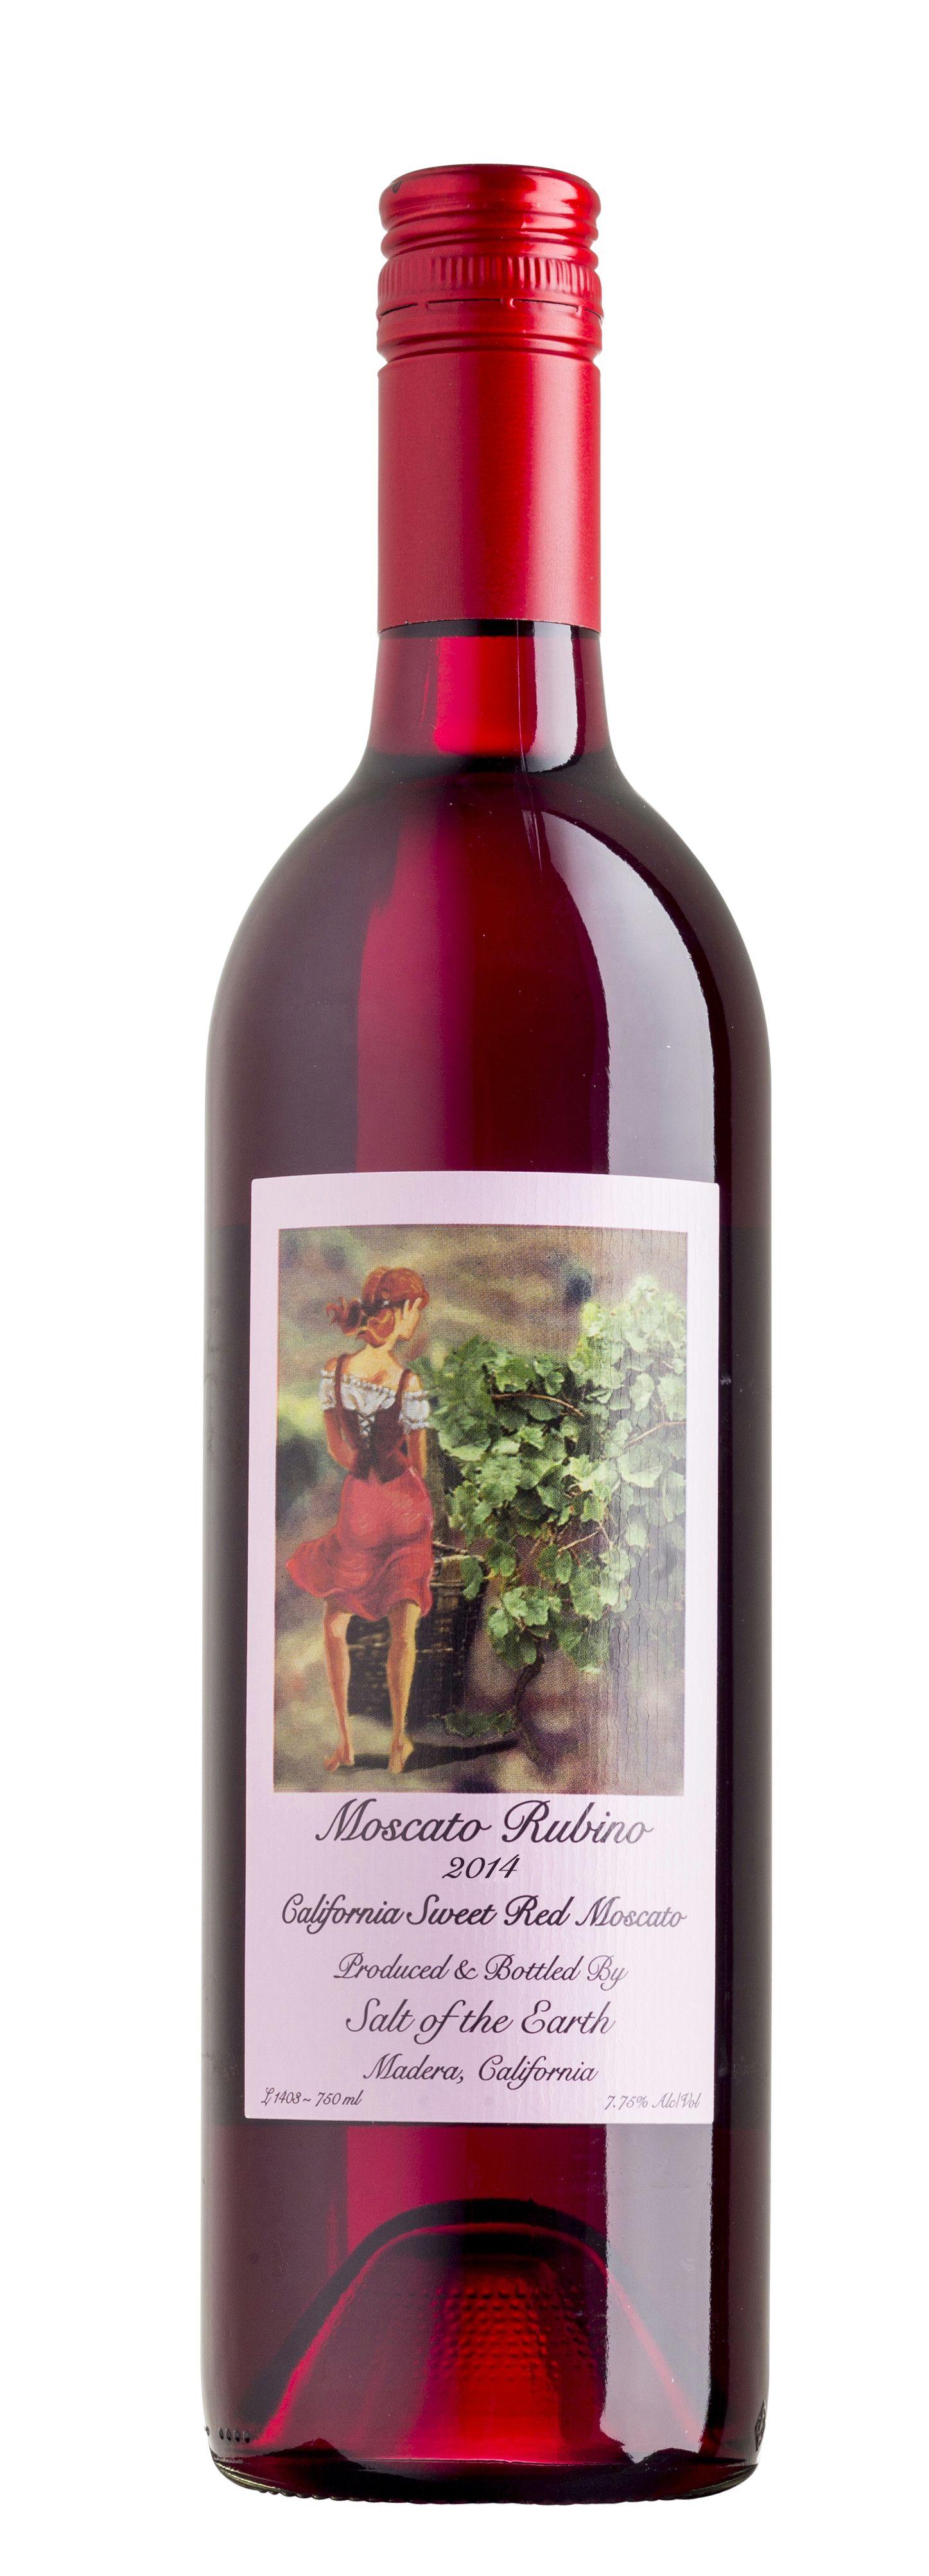 Flore De Moscato And Moscato Rubino Best Moscato Wine Moscato Moscato Wine